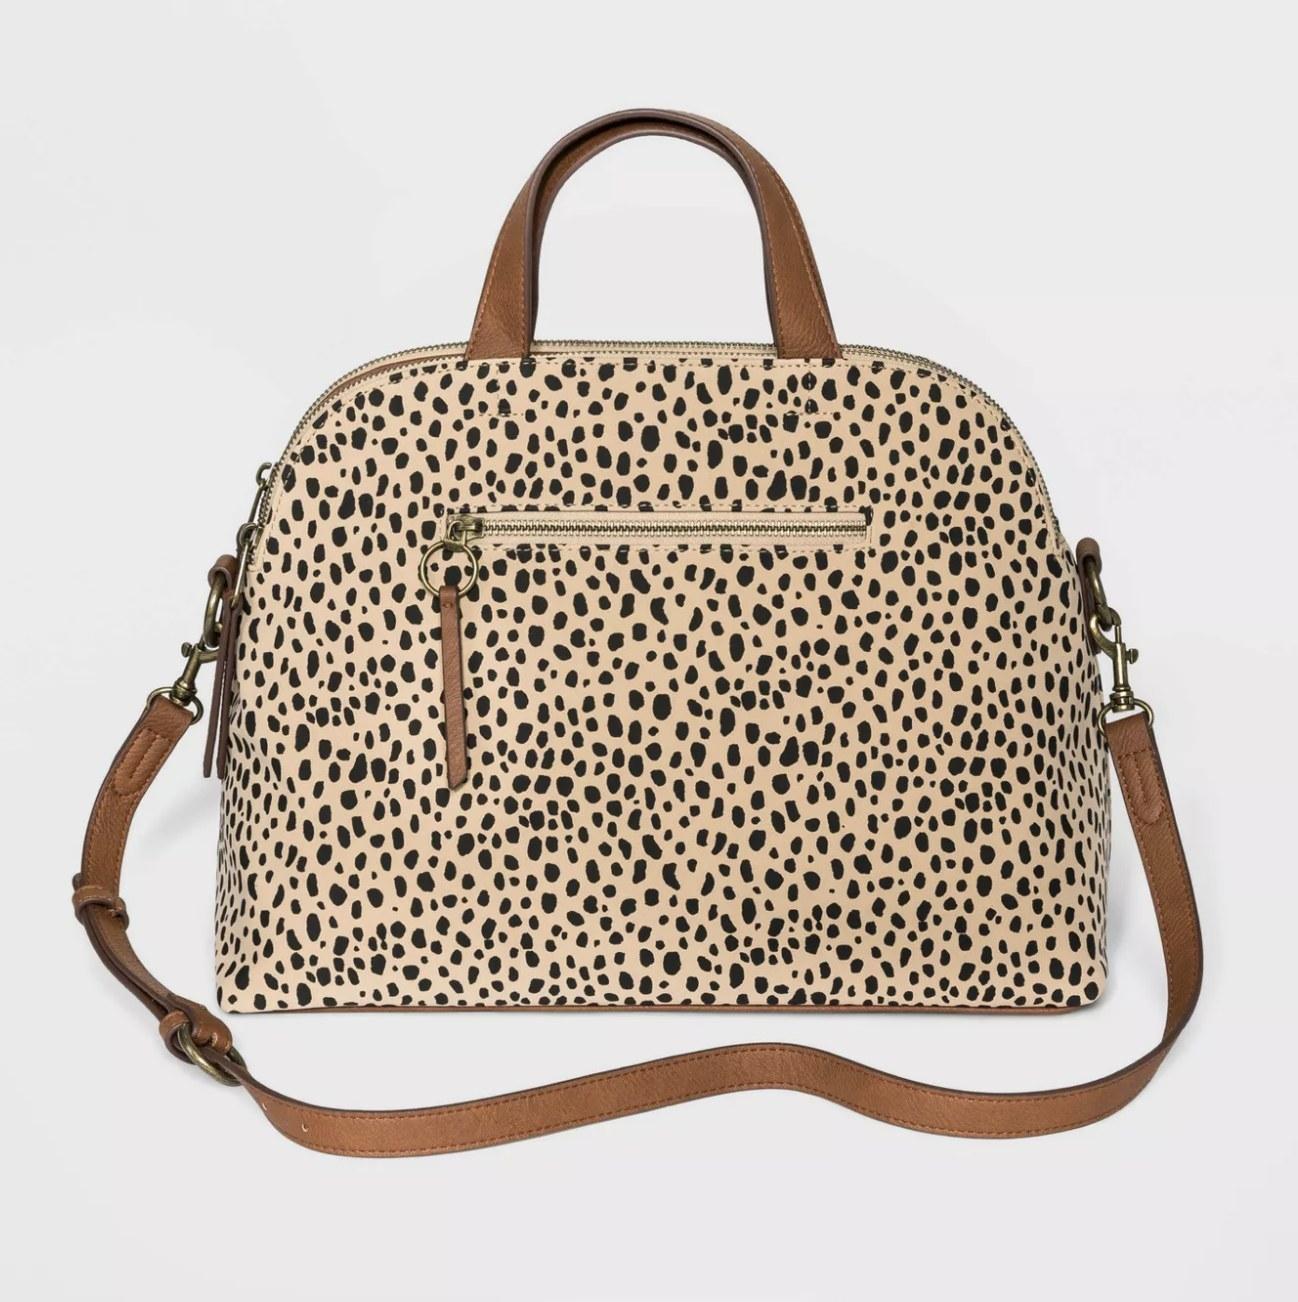 A shoulder bag with animal print